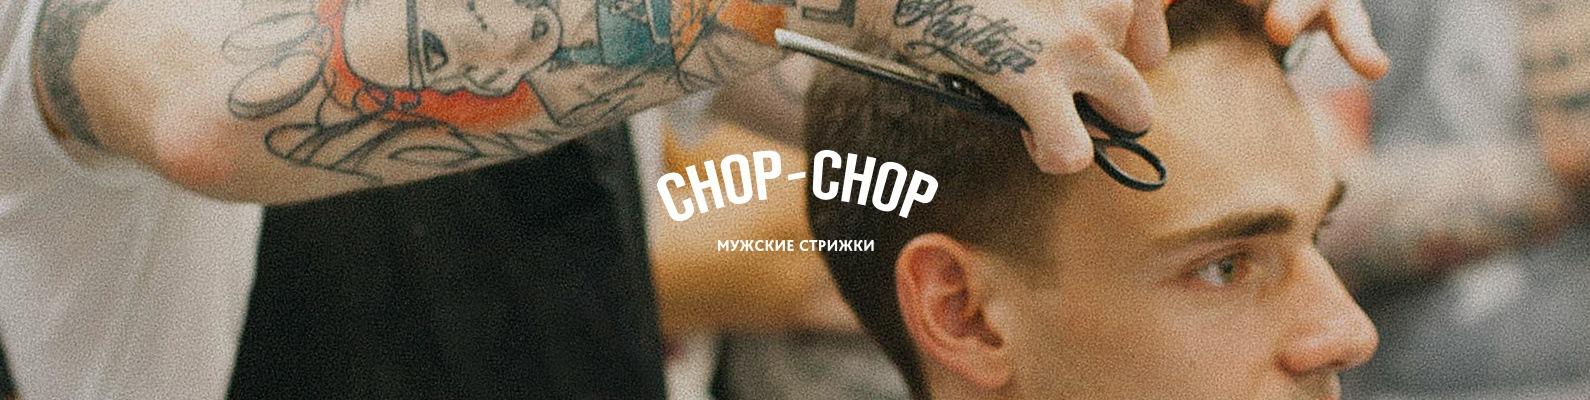 Chop-Chop | Сочи | ВКонтакте